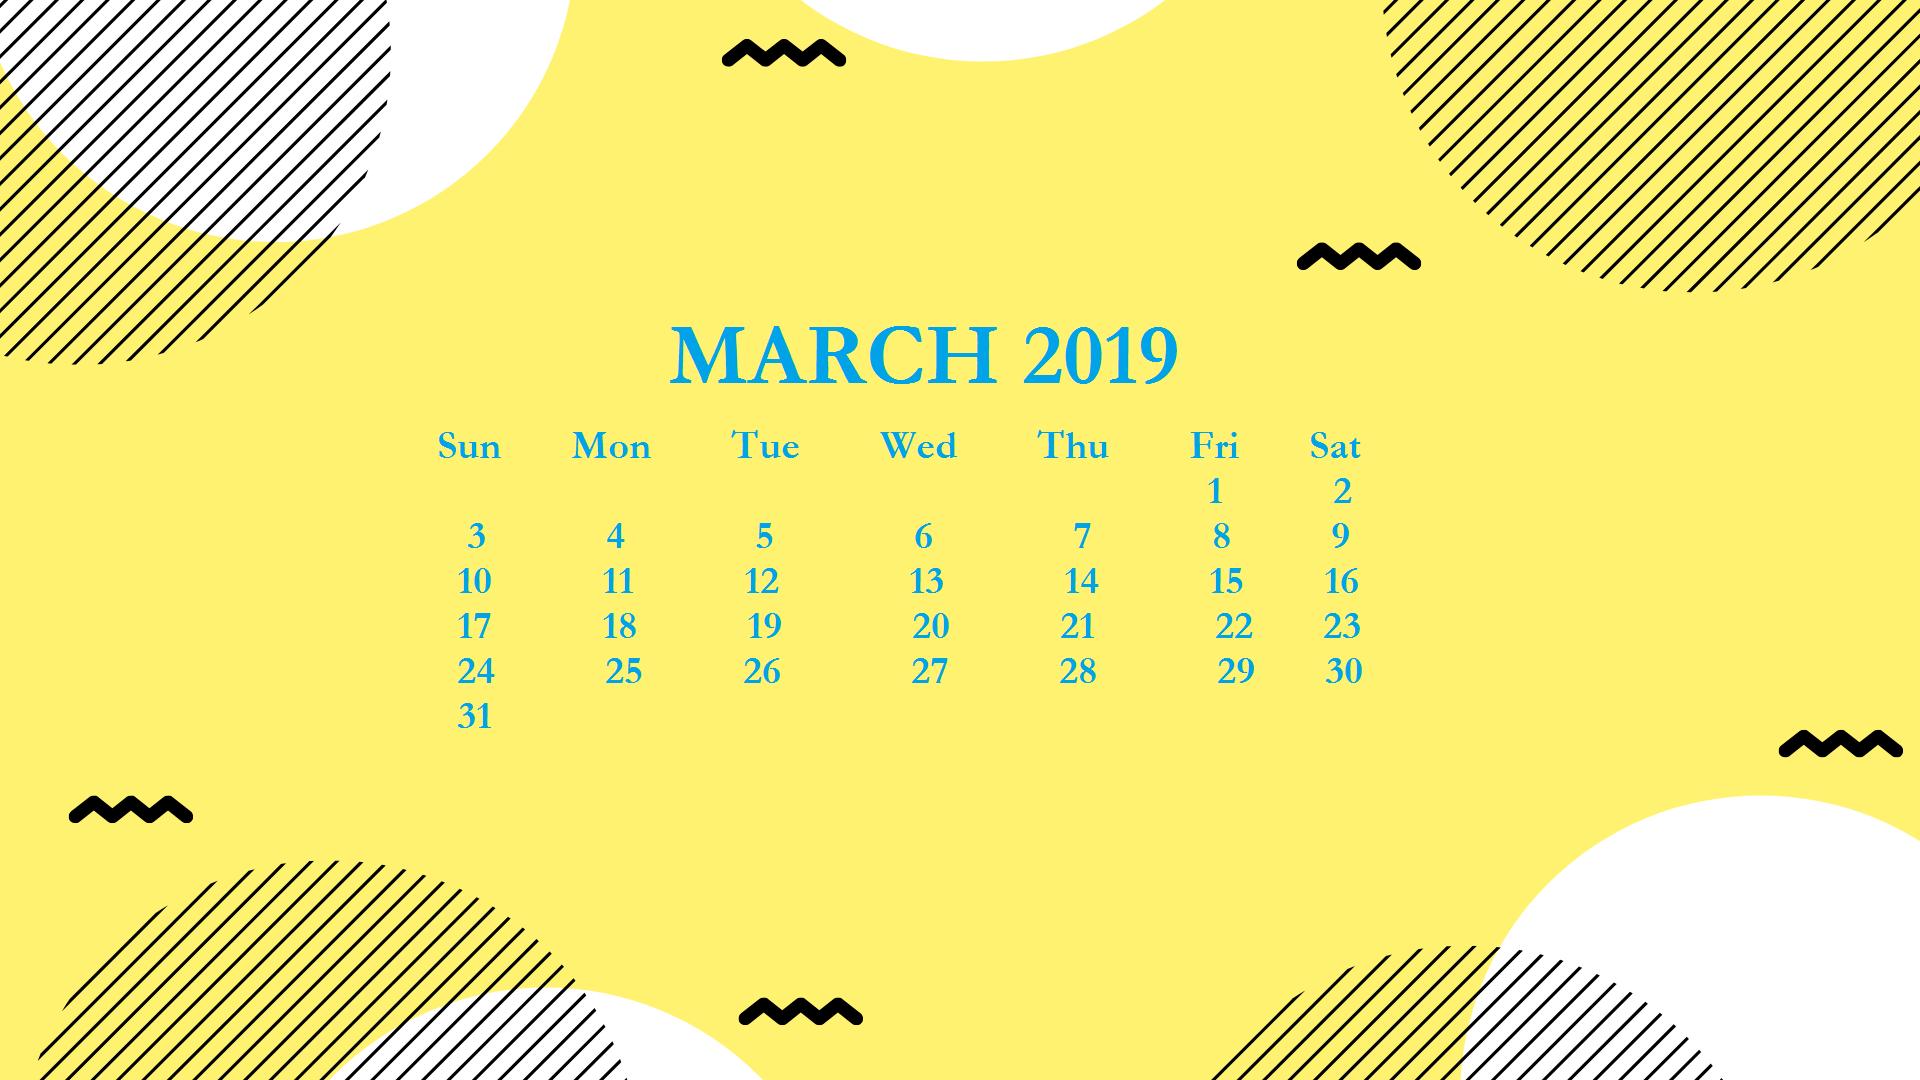 March Calendar Wallpaper Hd : Free march hd calendar wallpaper printable